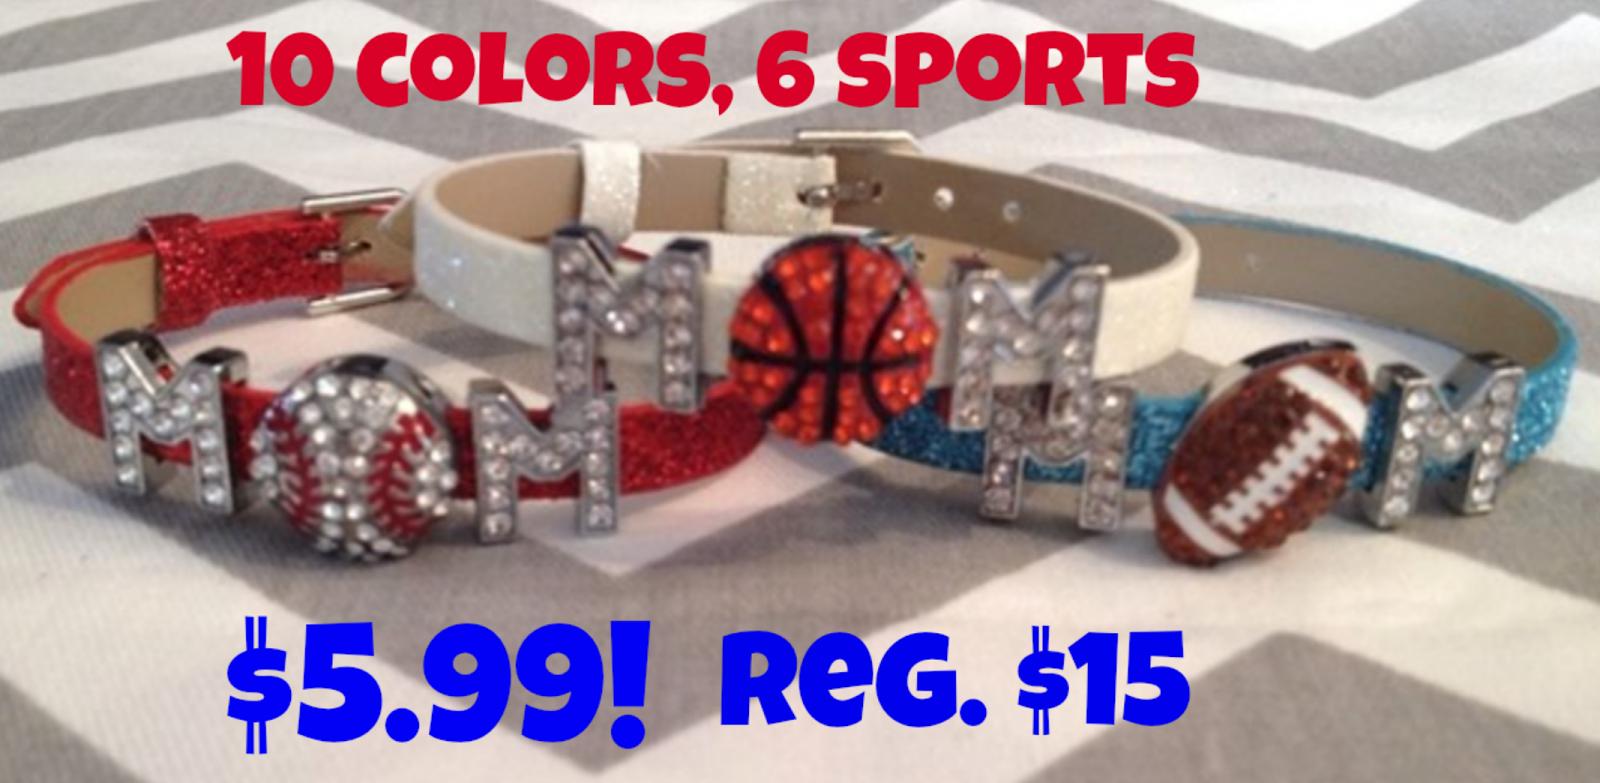 http://www.thebinderladies.com/2015/02/jane-sparkle-mom-sports-bracelets-10.html